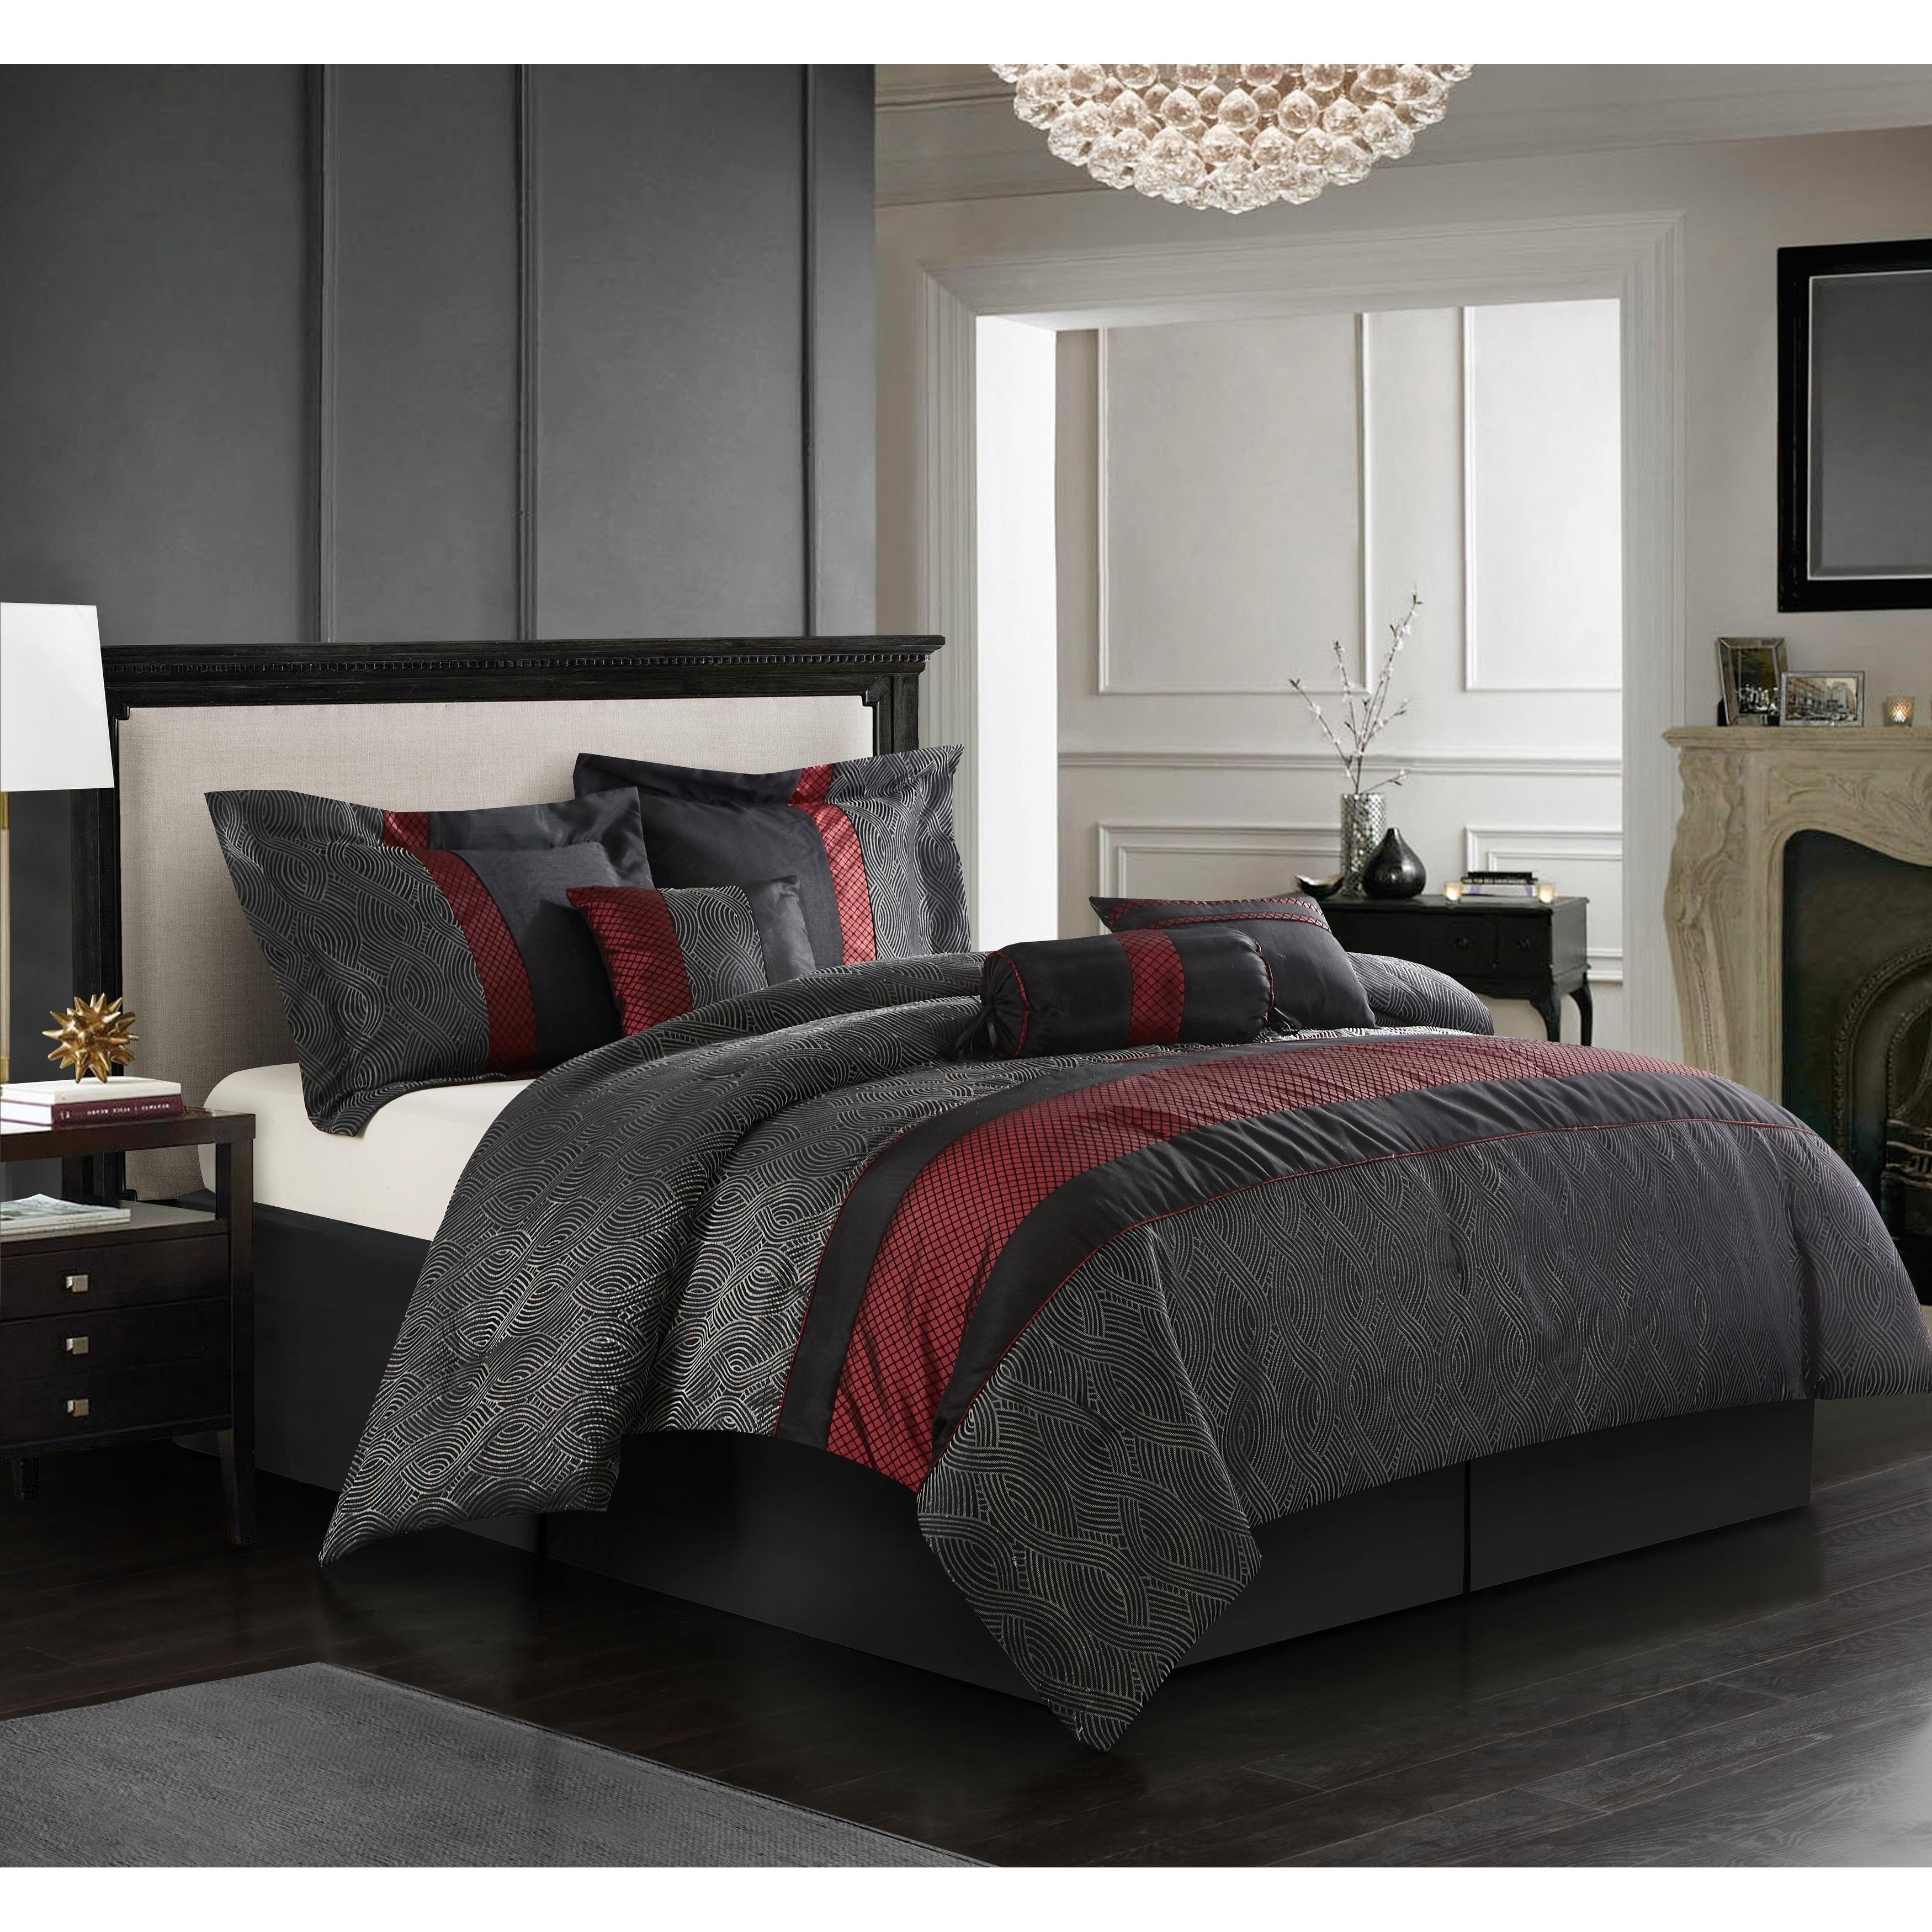 Grand Avenue Ester Red Black 7 Piece Comforter Set On Sale Overstock 11711781 Full